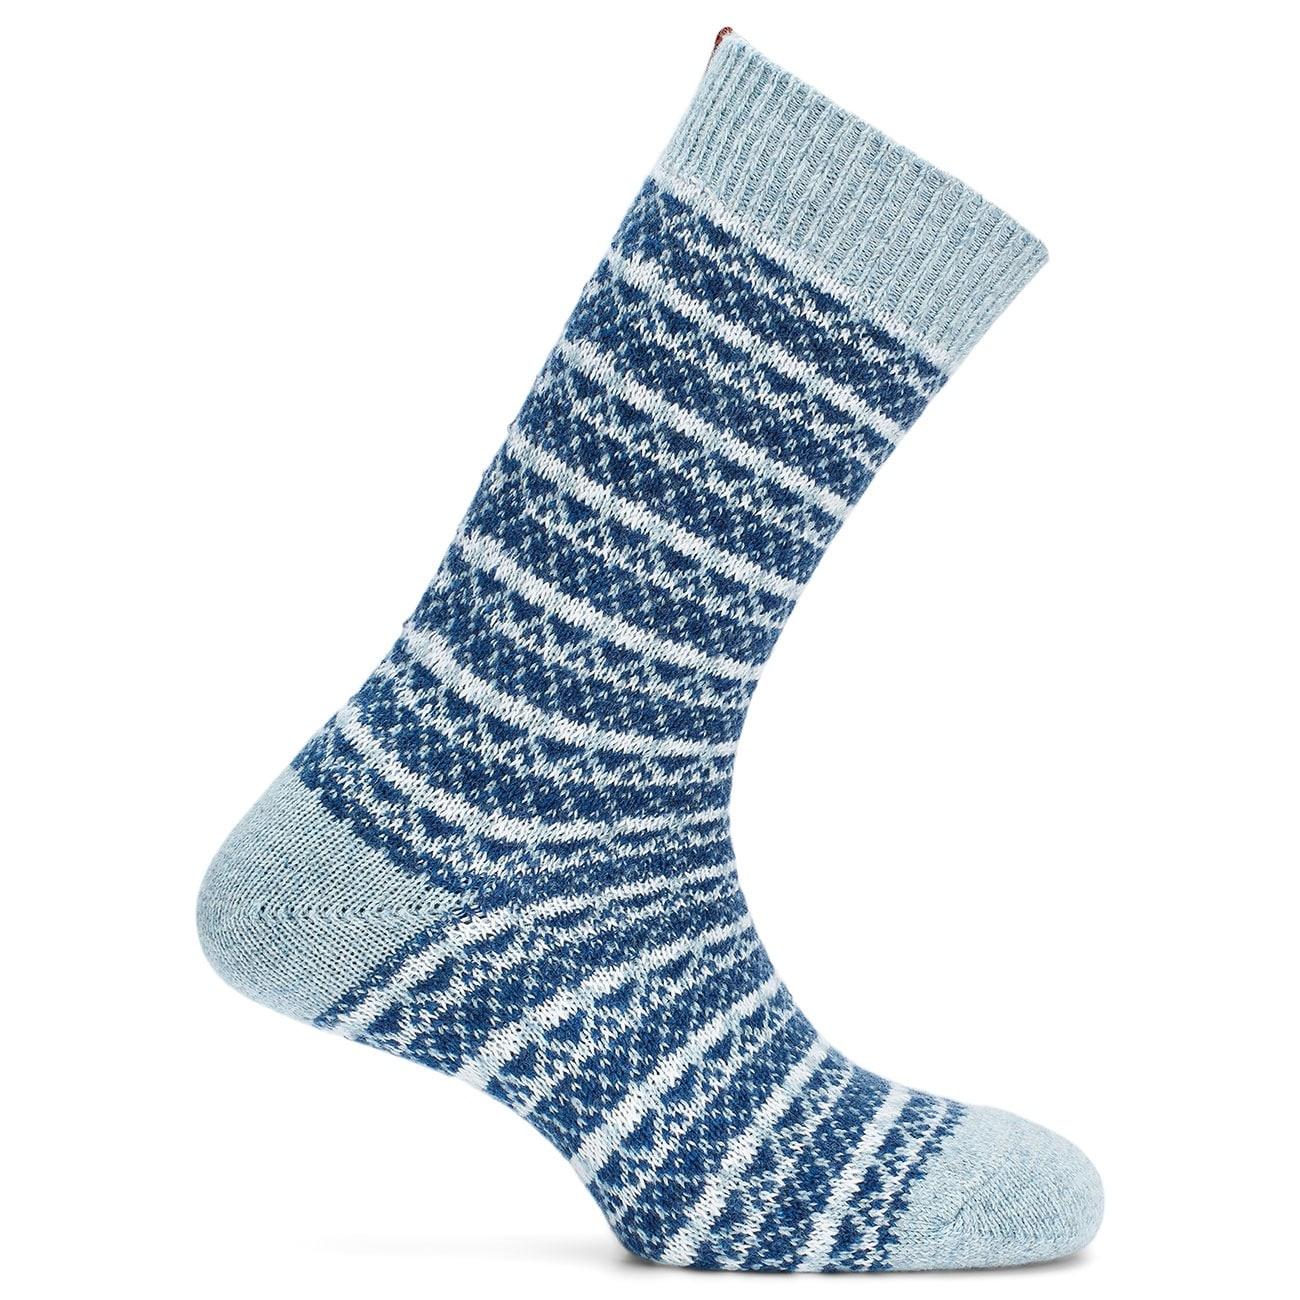 Amundsen Sports Skauen Mid Calf Sock